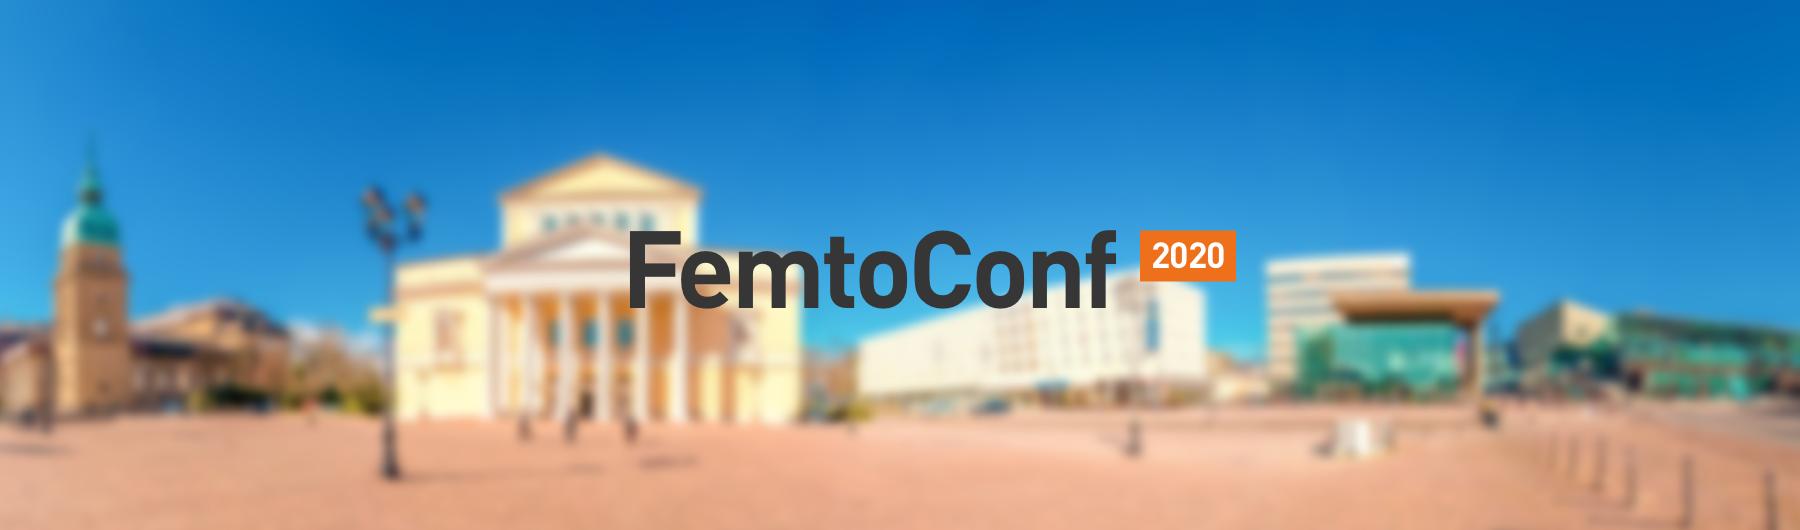 FemtoConf 2020